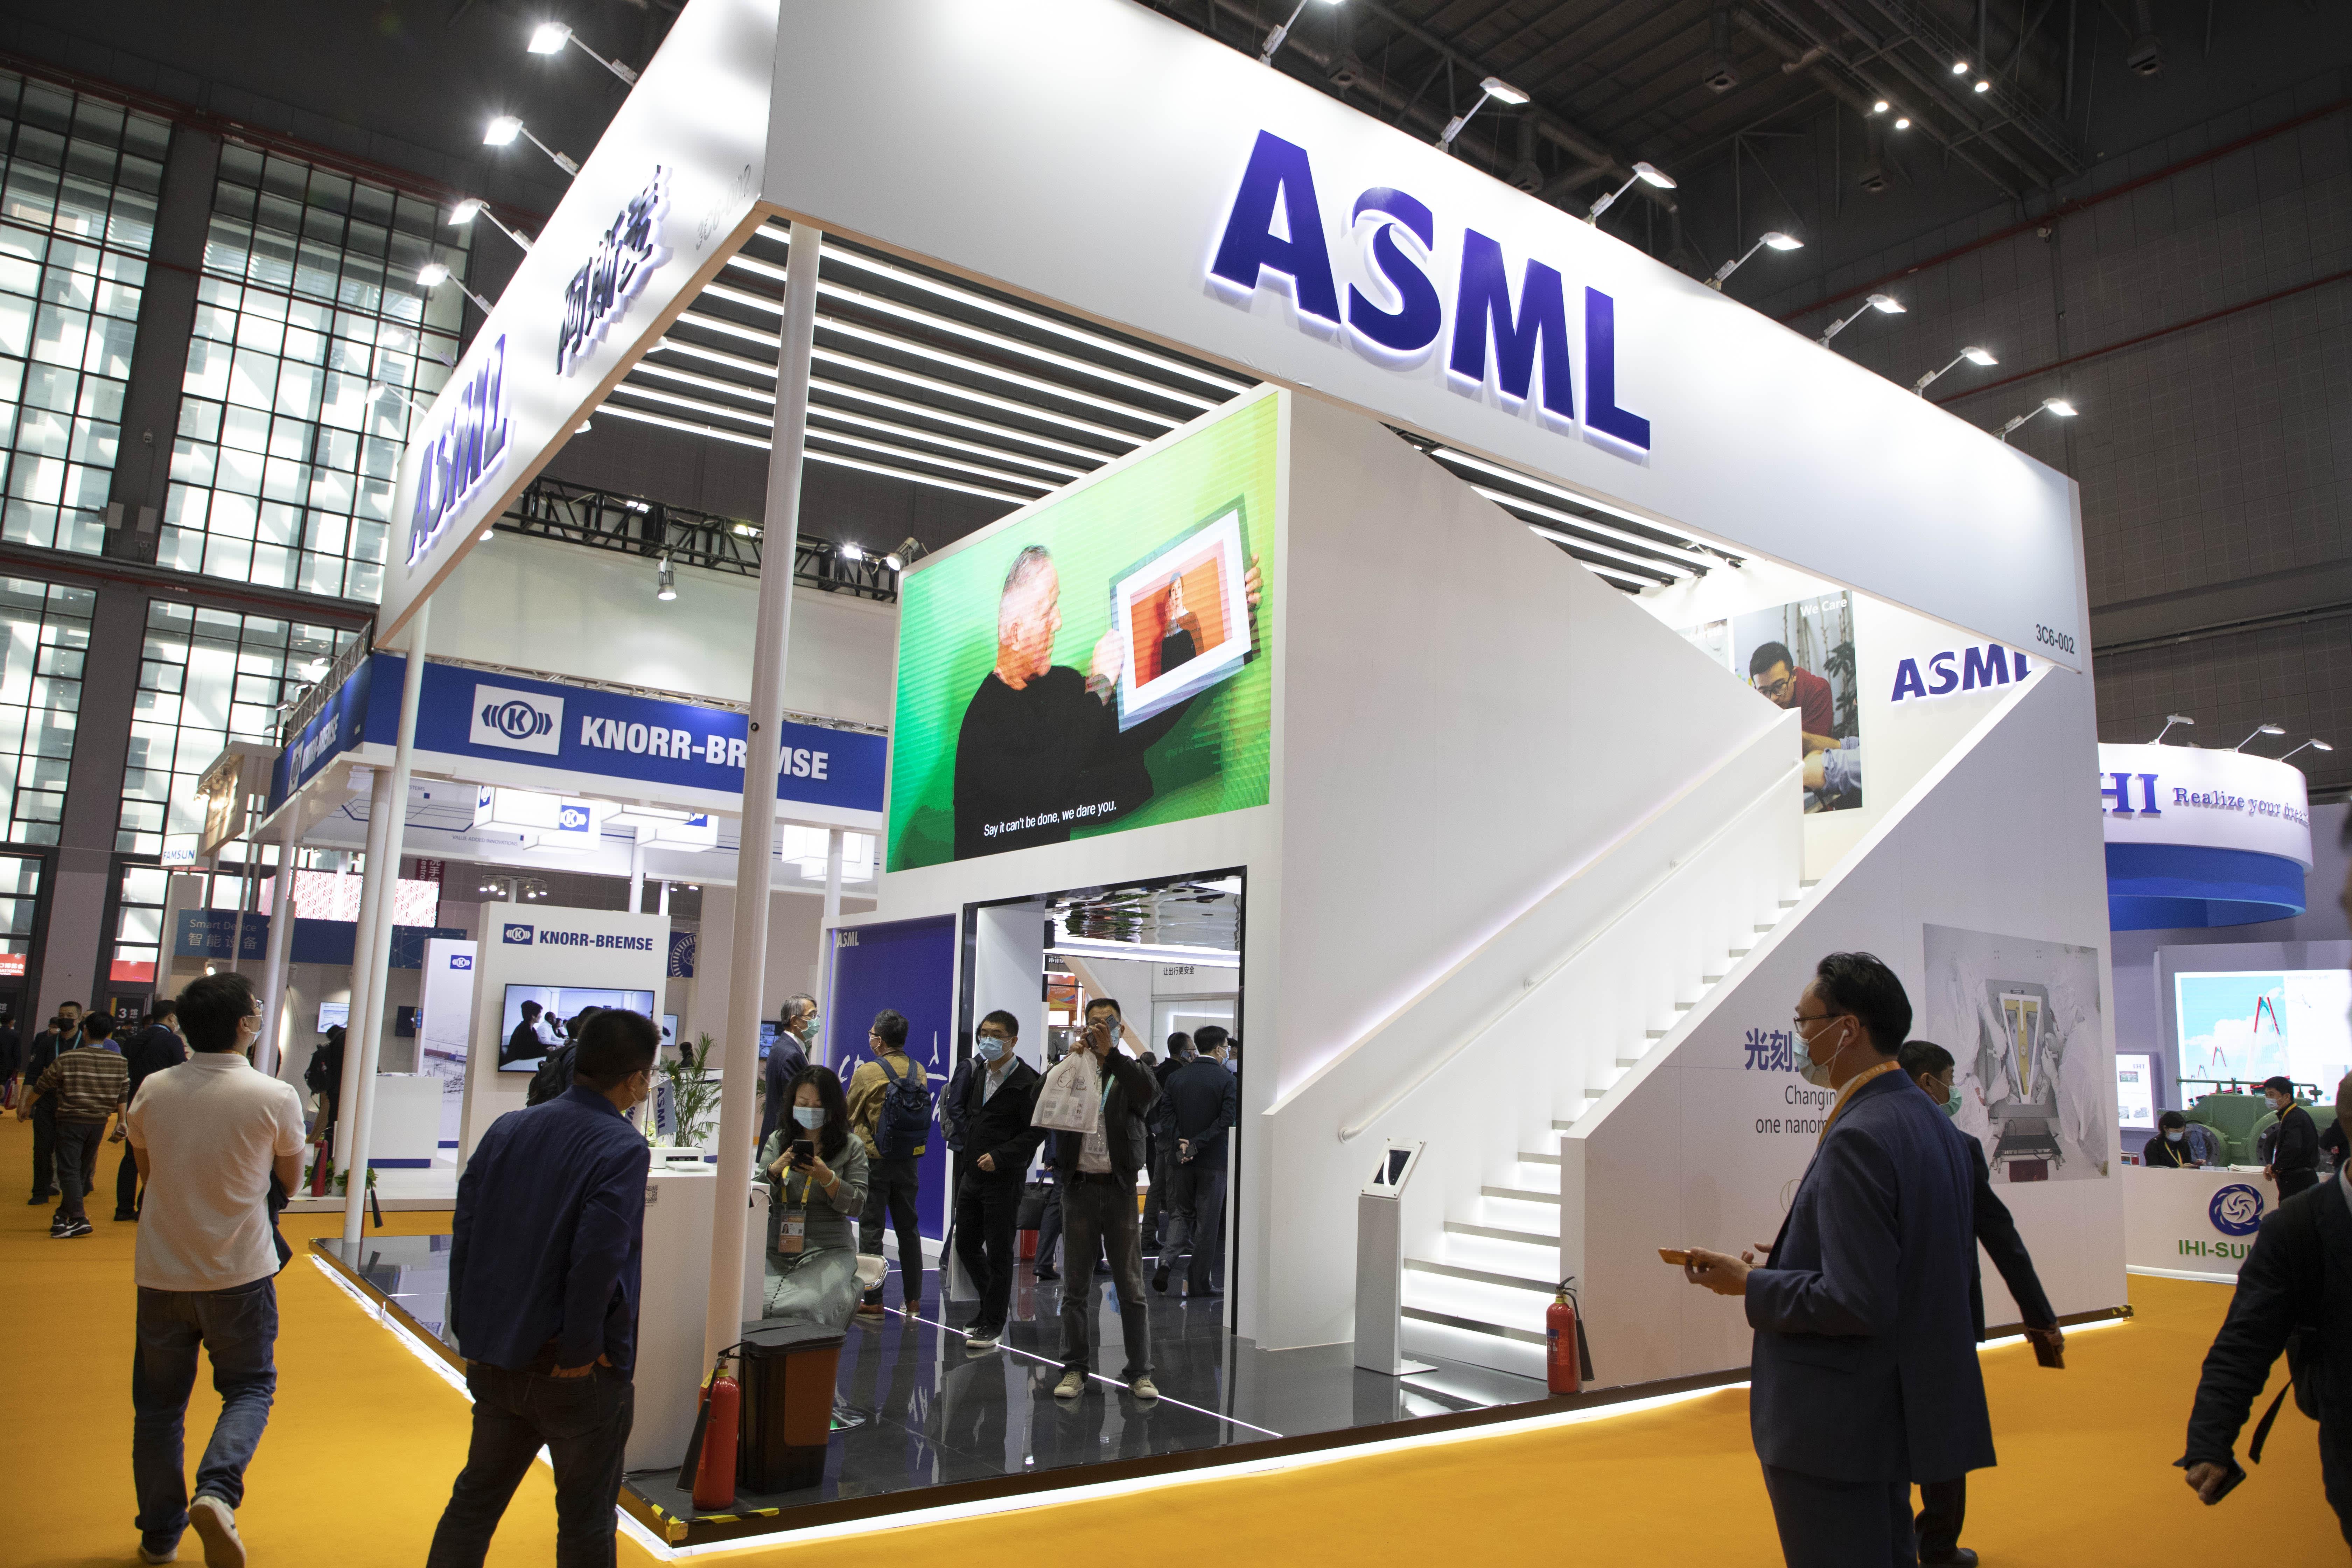 Chip machine maker ASML will grow into a $500 billion business next year, tech investors predict thumbnail